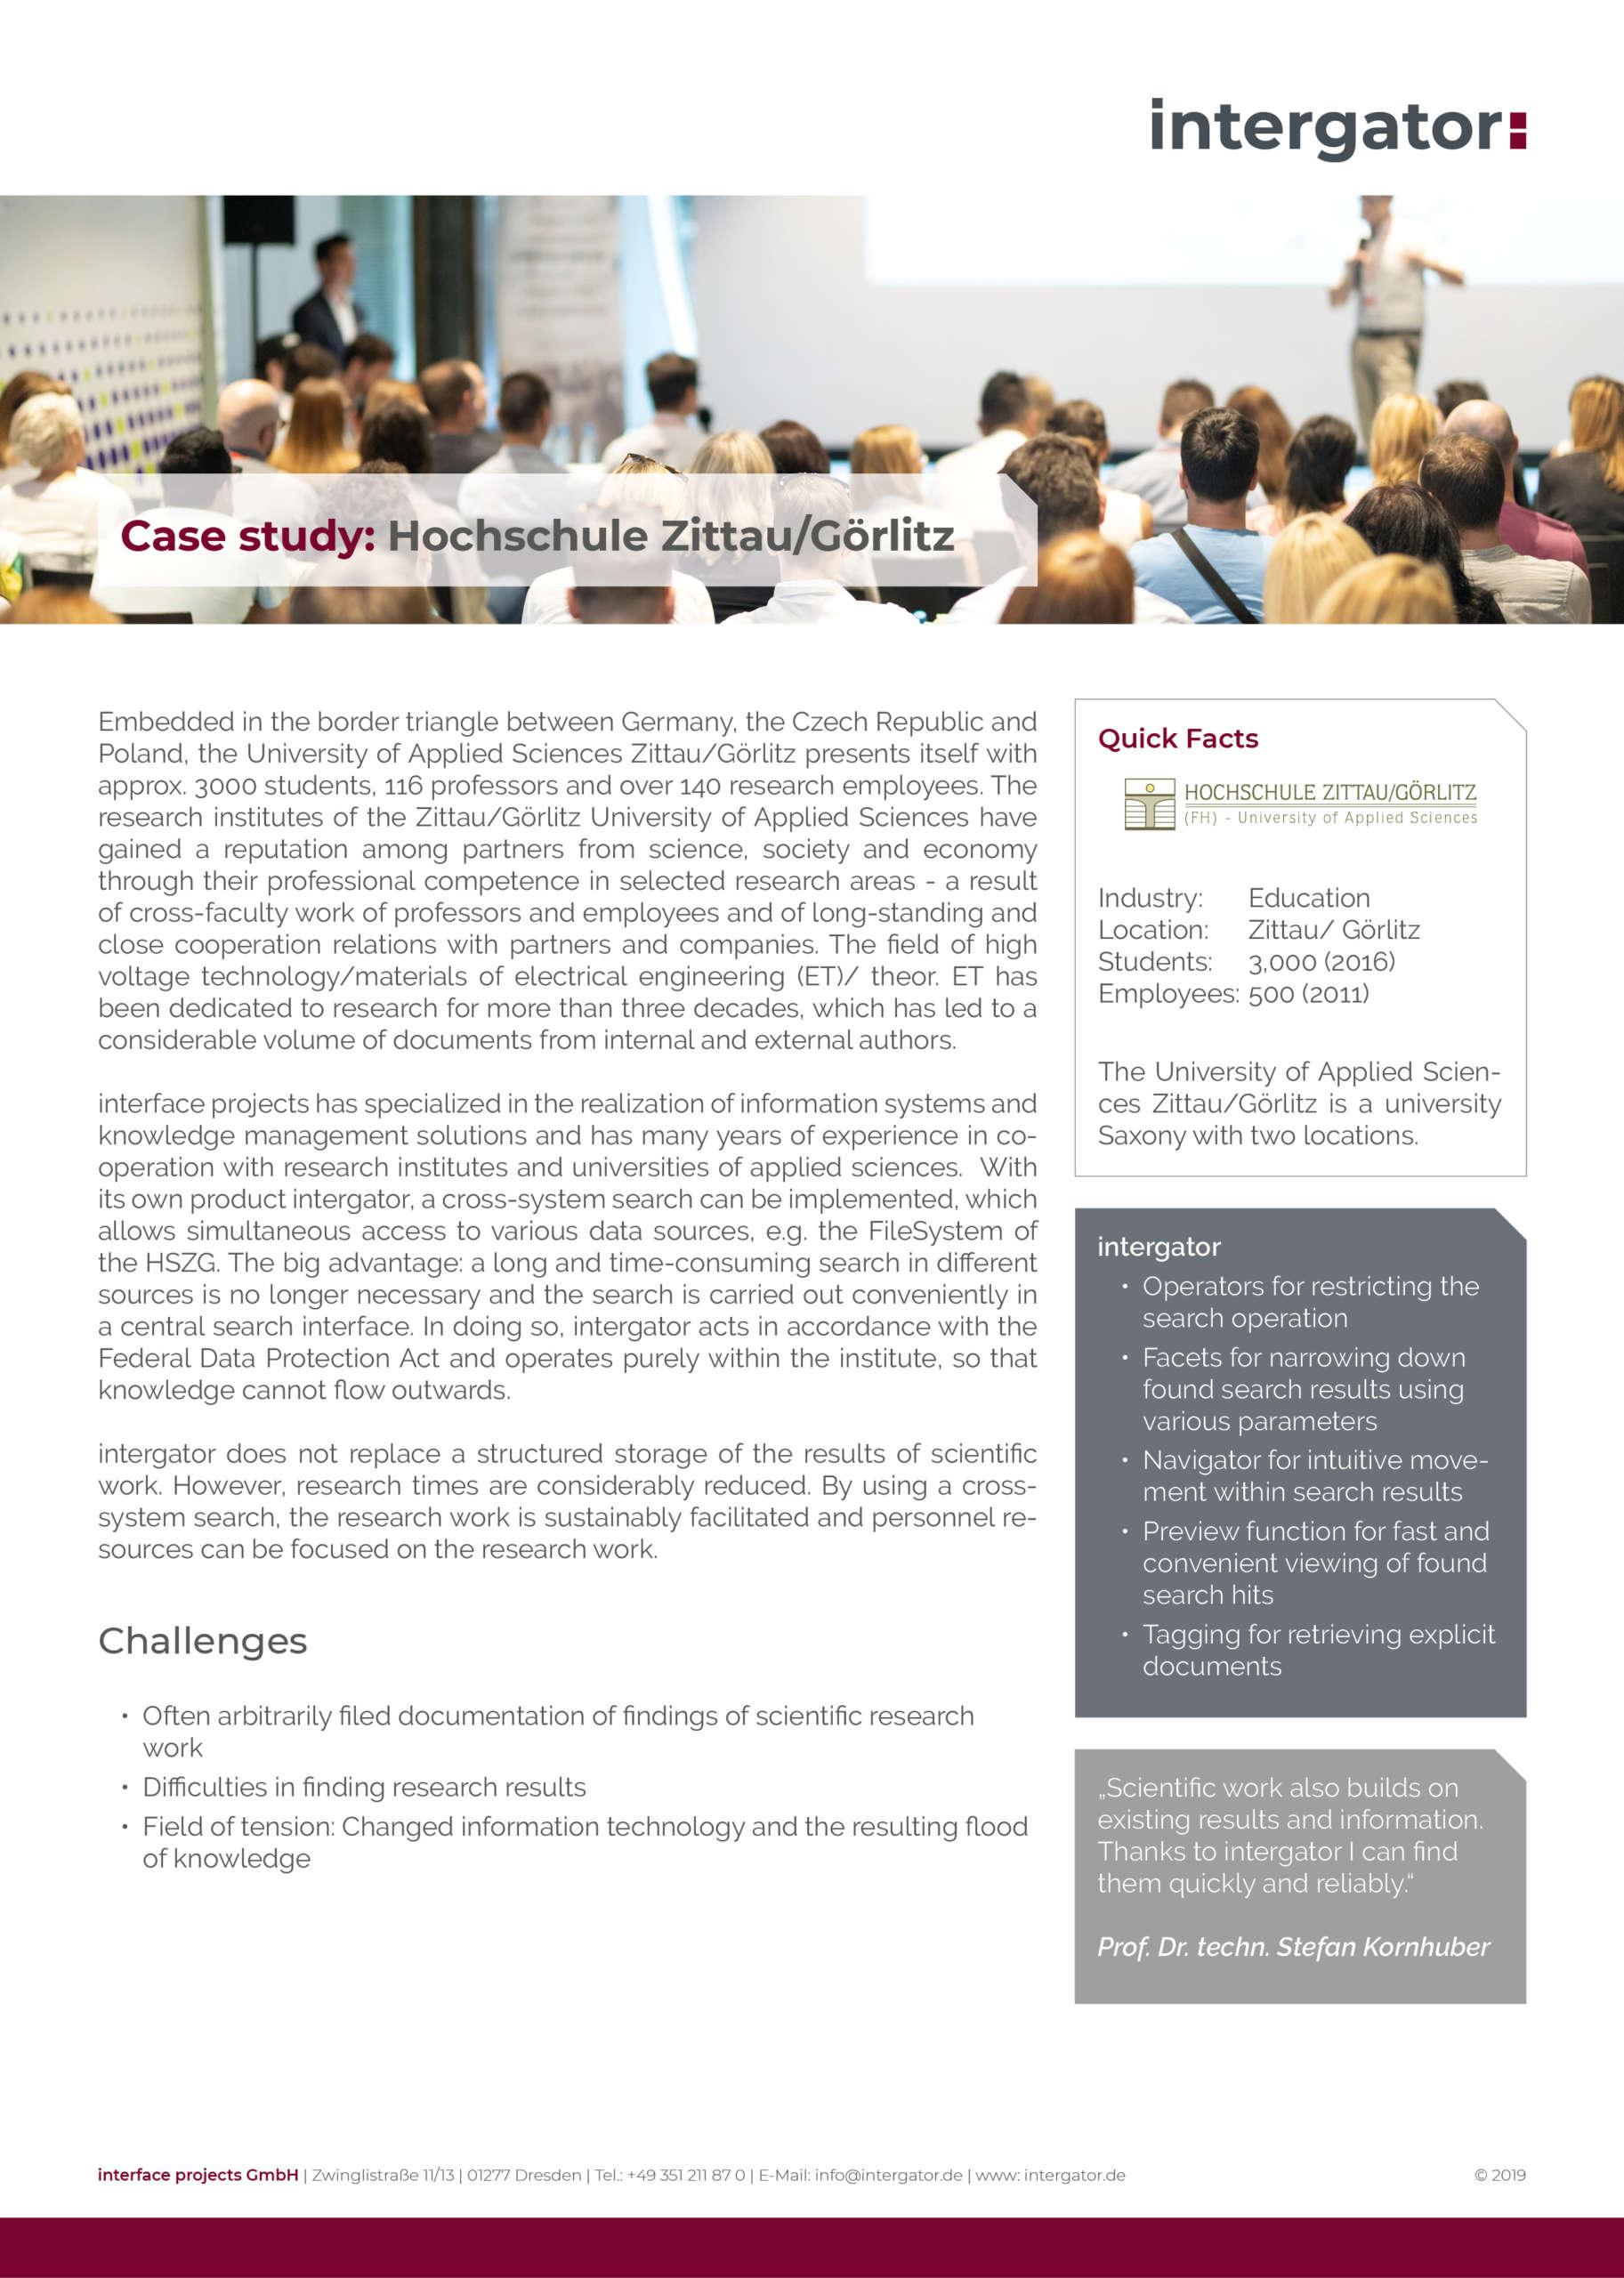 Case study: University of Zittau/ Görlitz